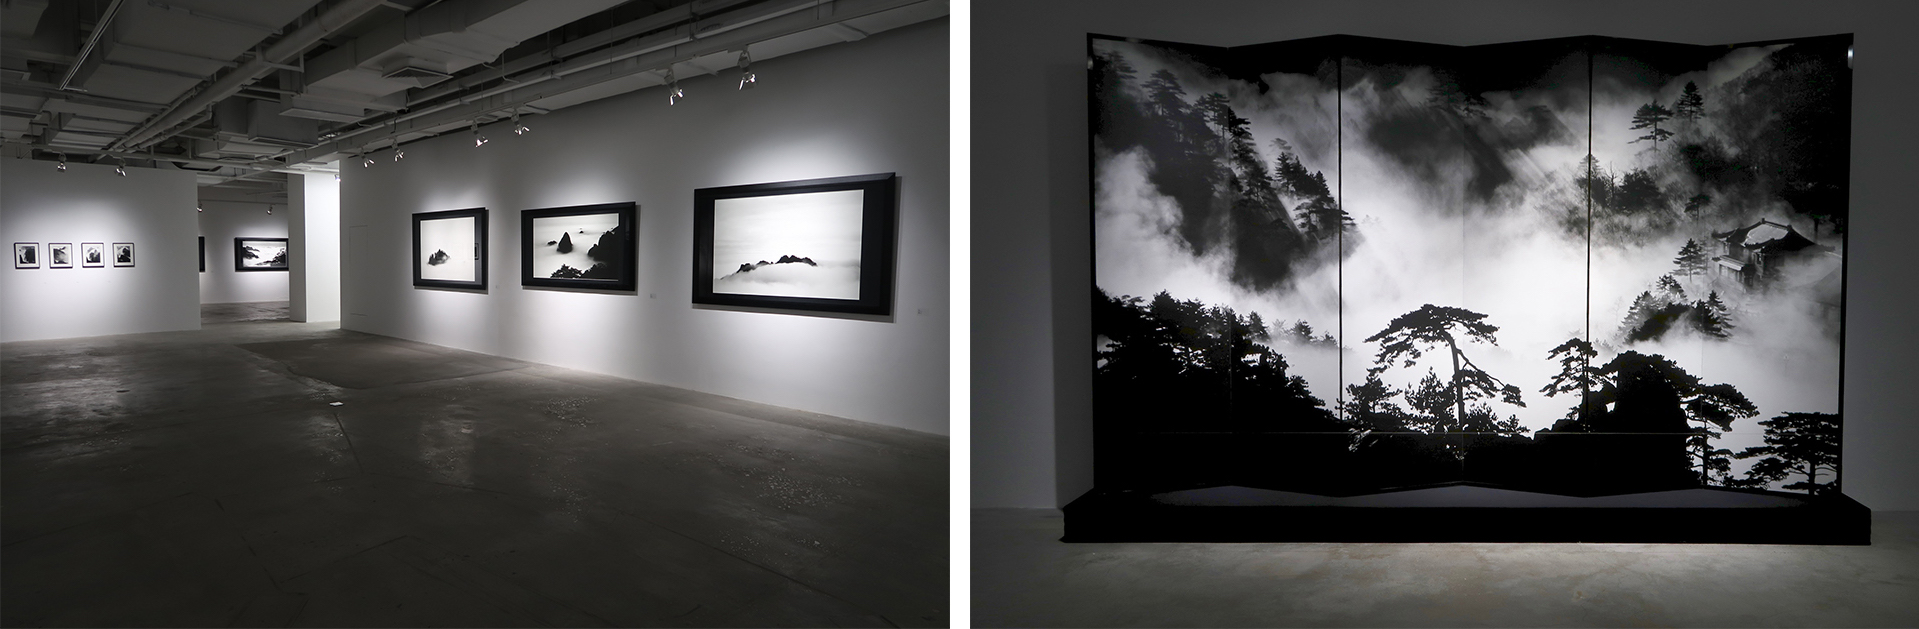 Wang Wusheng's works at Three Shadows Xiamen Photography Art Centre, exhibition view © Marine Cabos